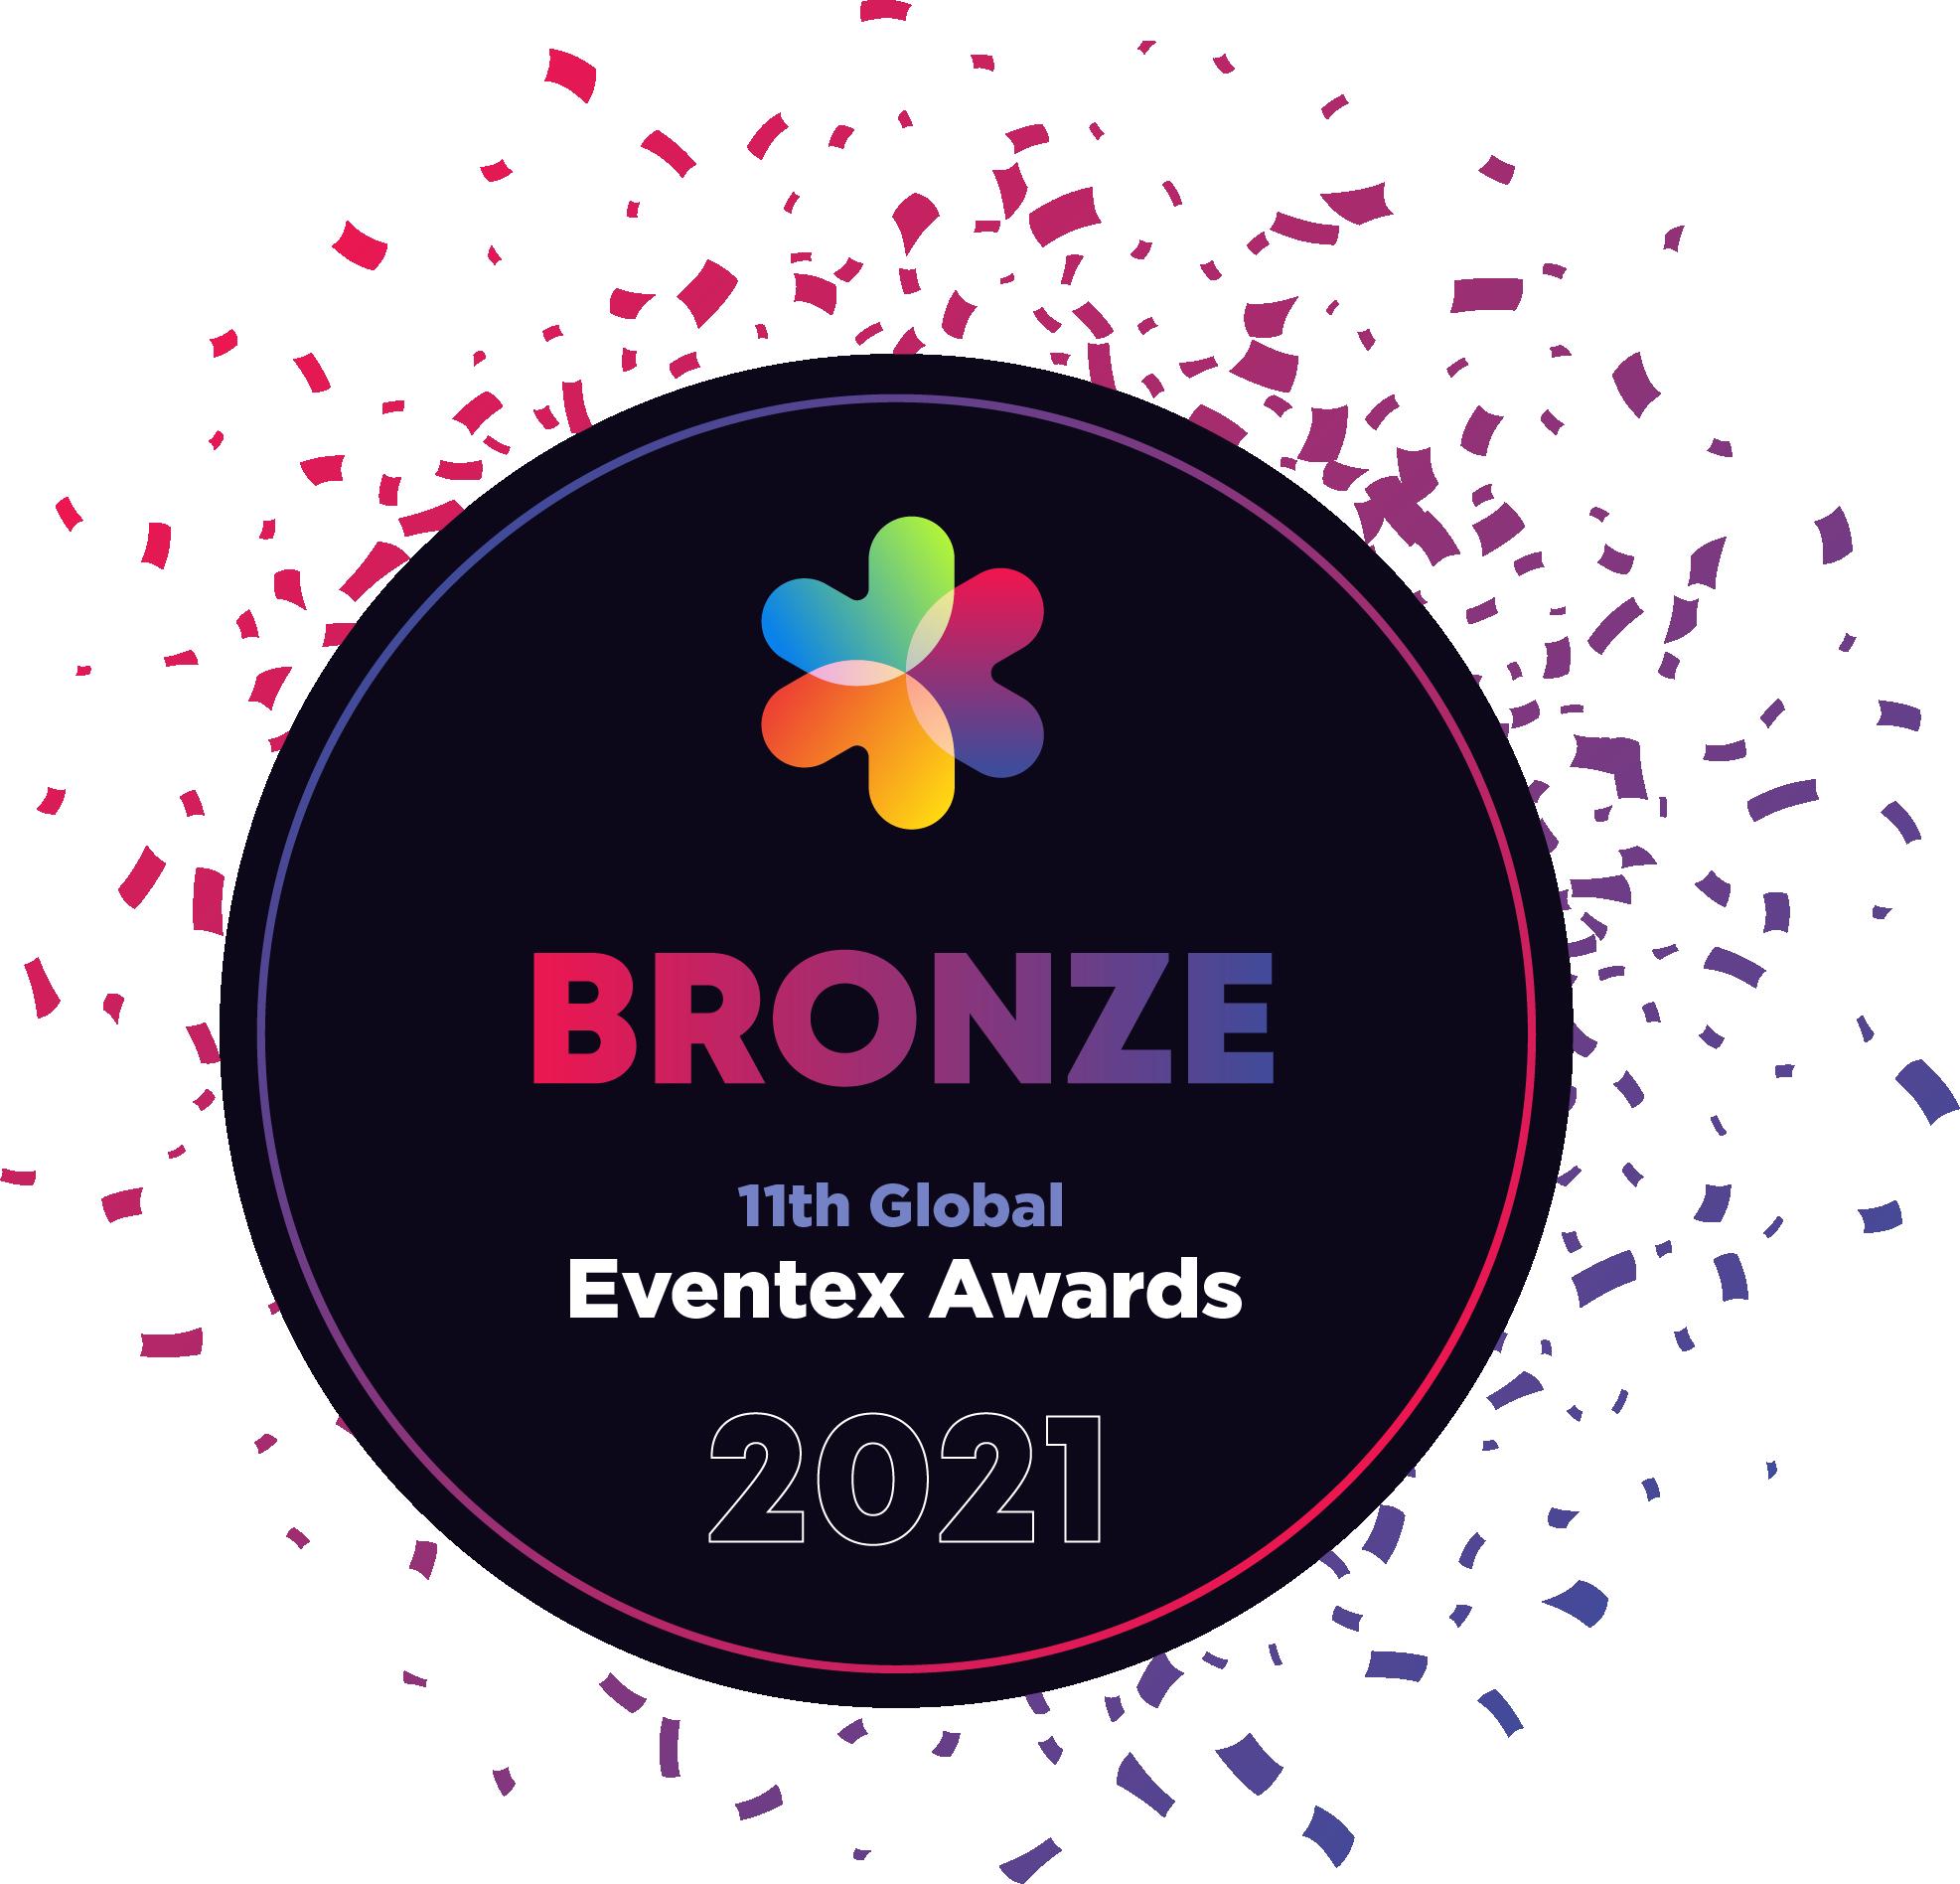 11th Global Eventex Bronze Award Winner